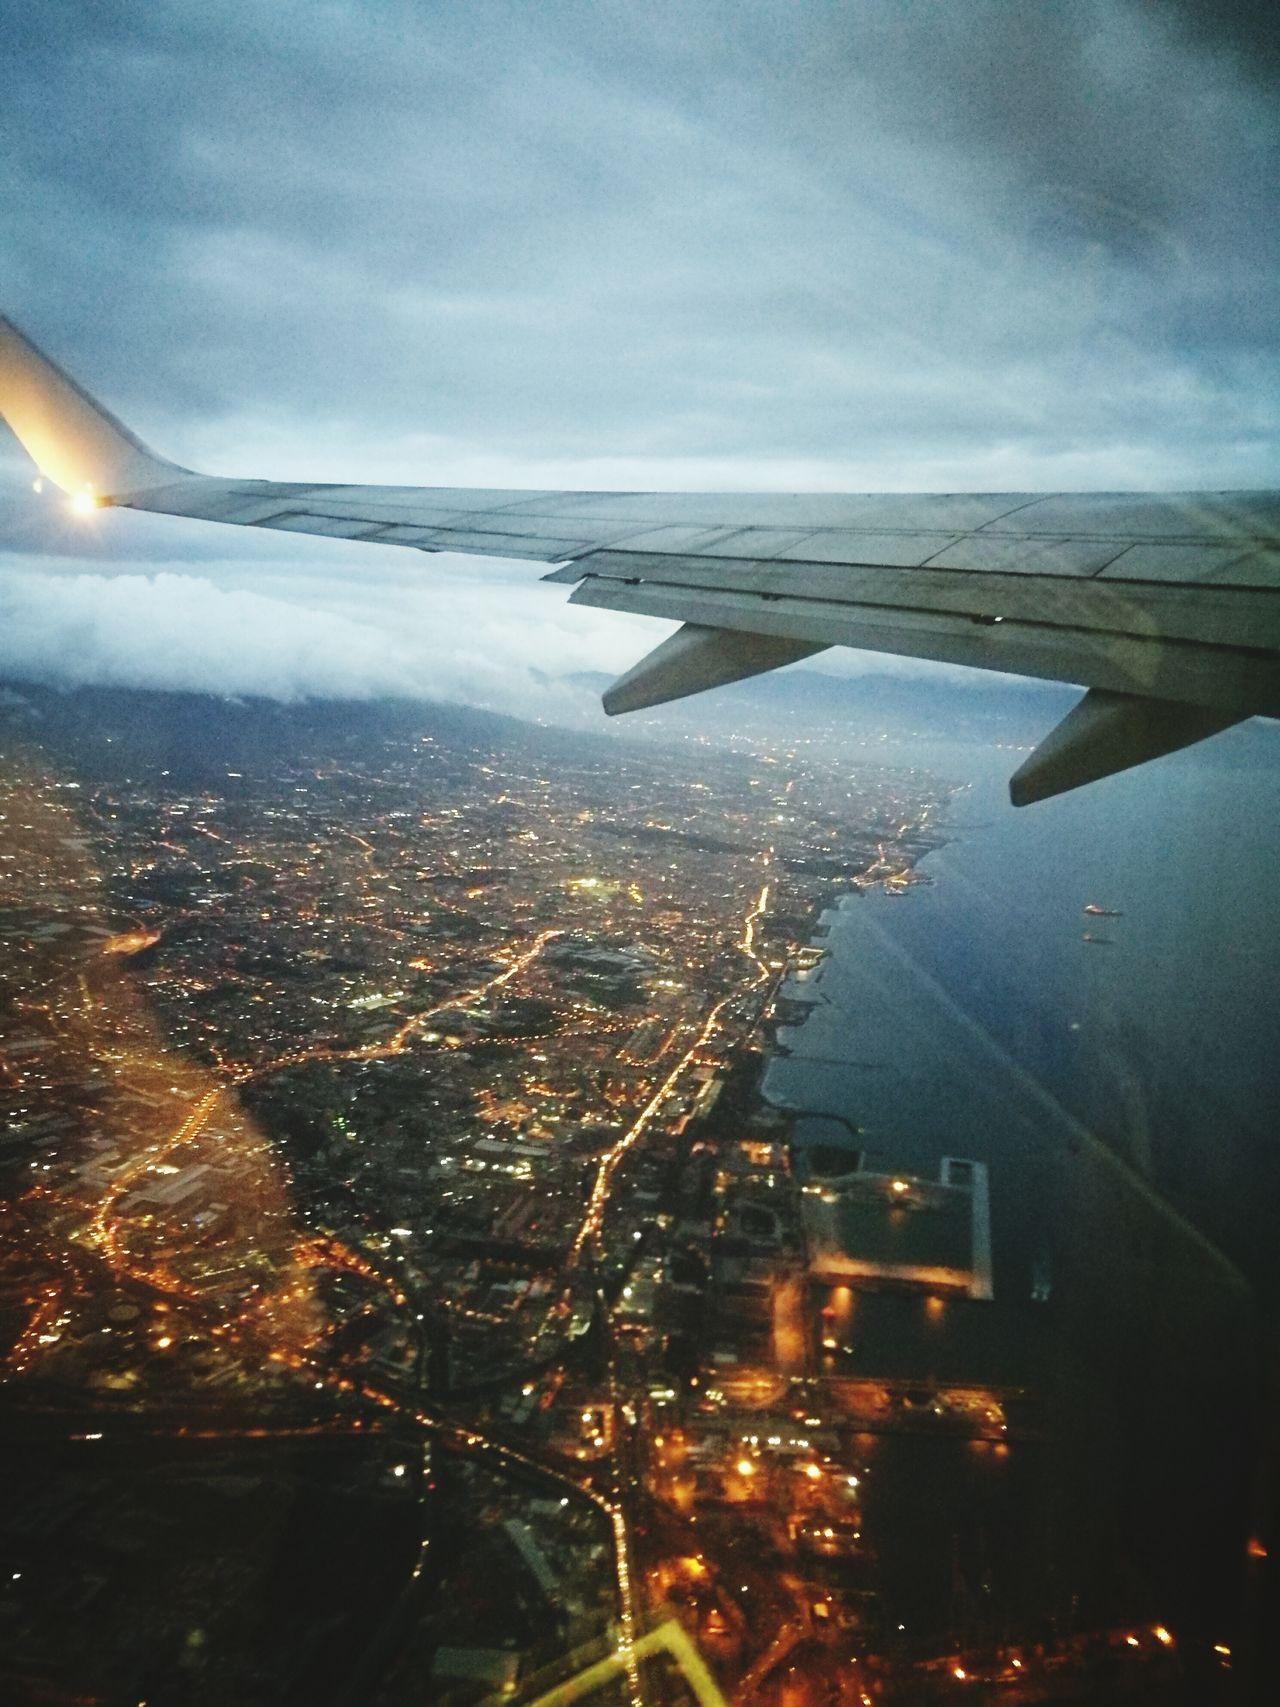 Napoli ❤ Aerial View City Airplane Illuminated Sea Night Love Naples